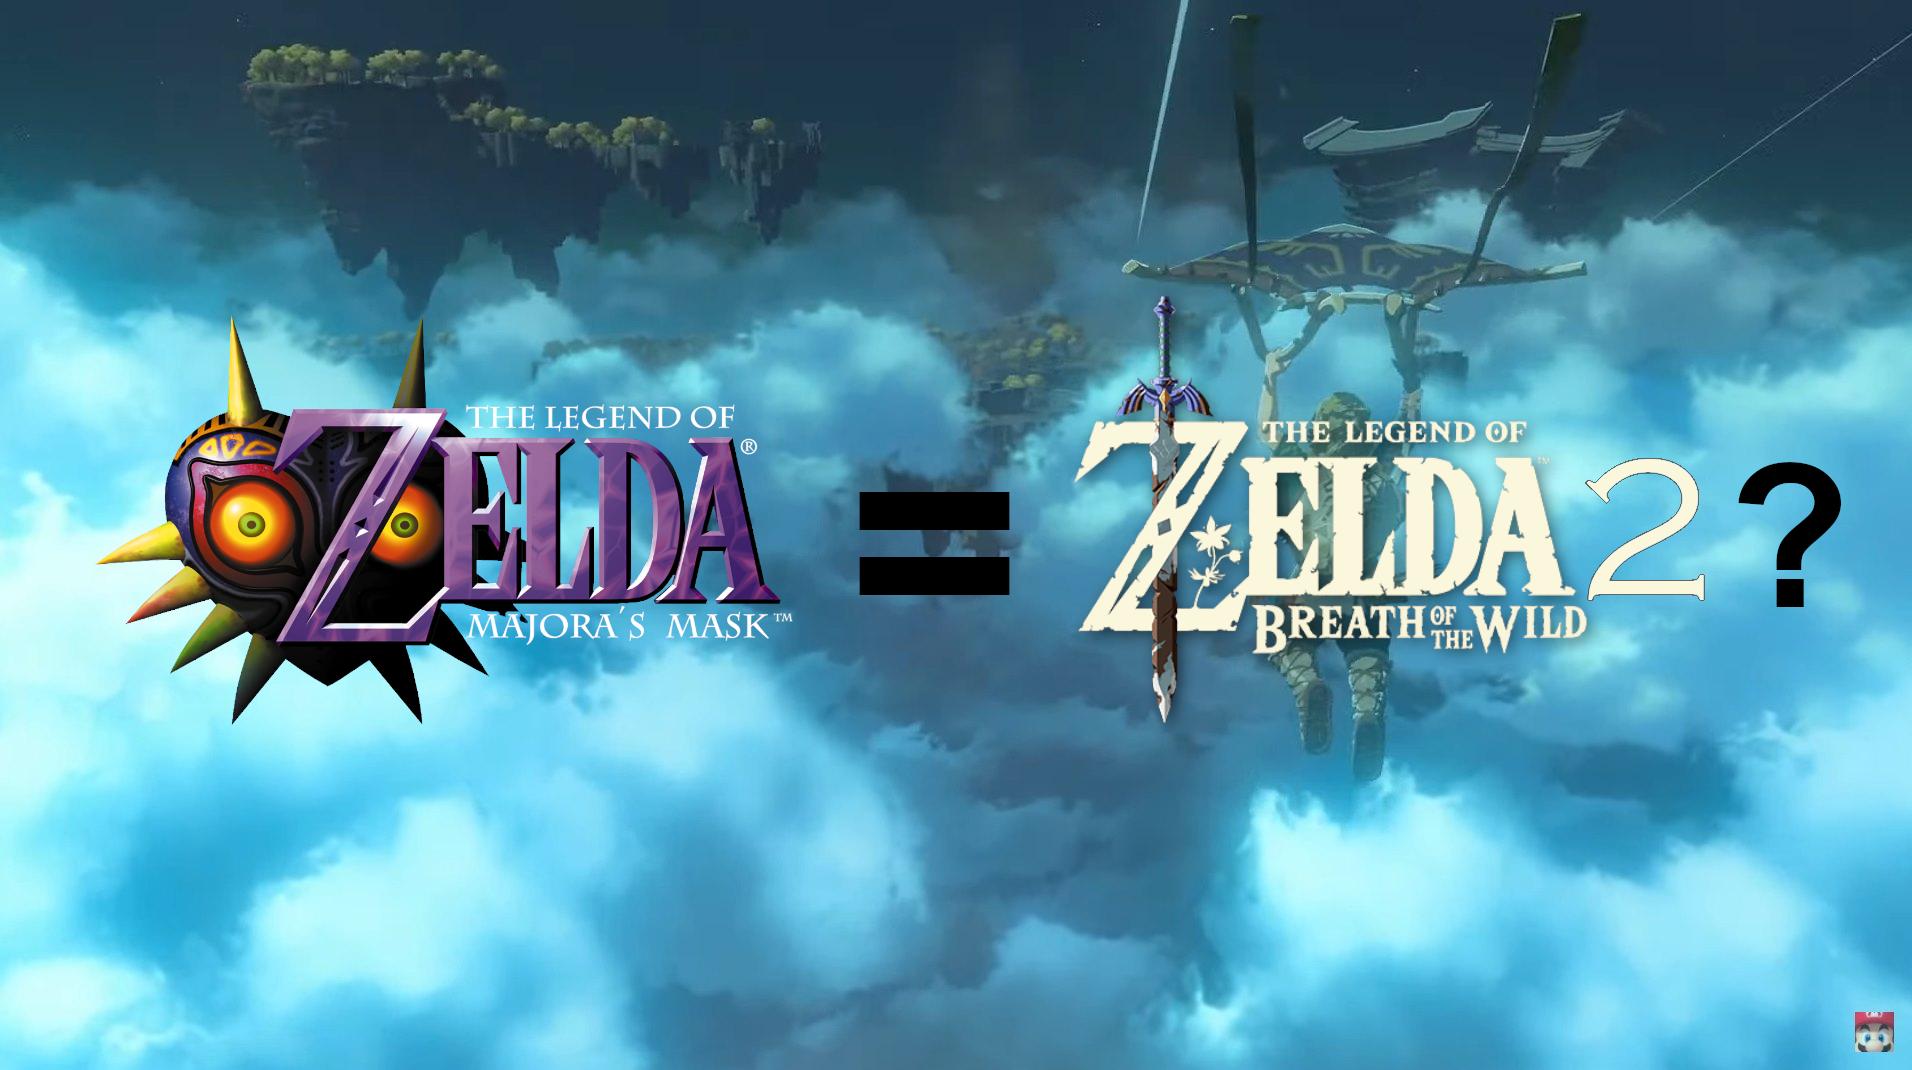 Nintendo Dispells Comparison Between Breath of the Wild 2 and Majora's Mask